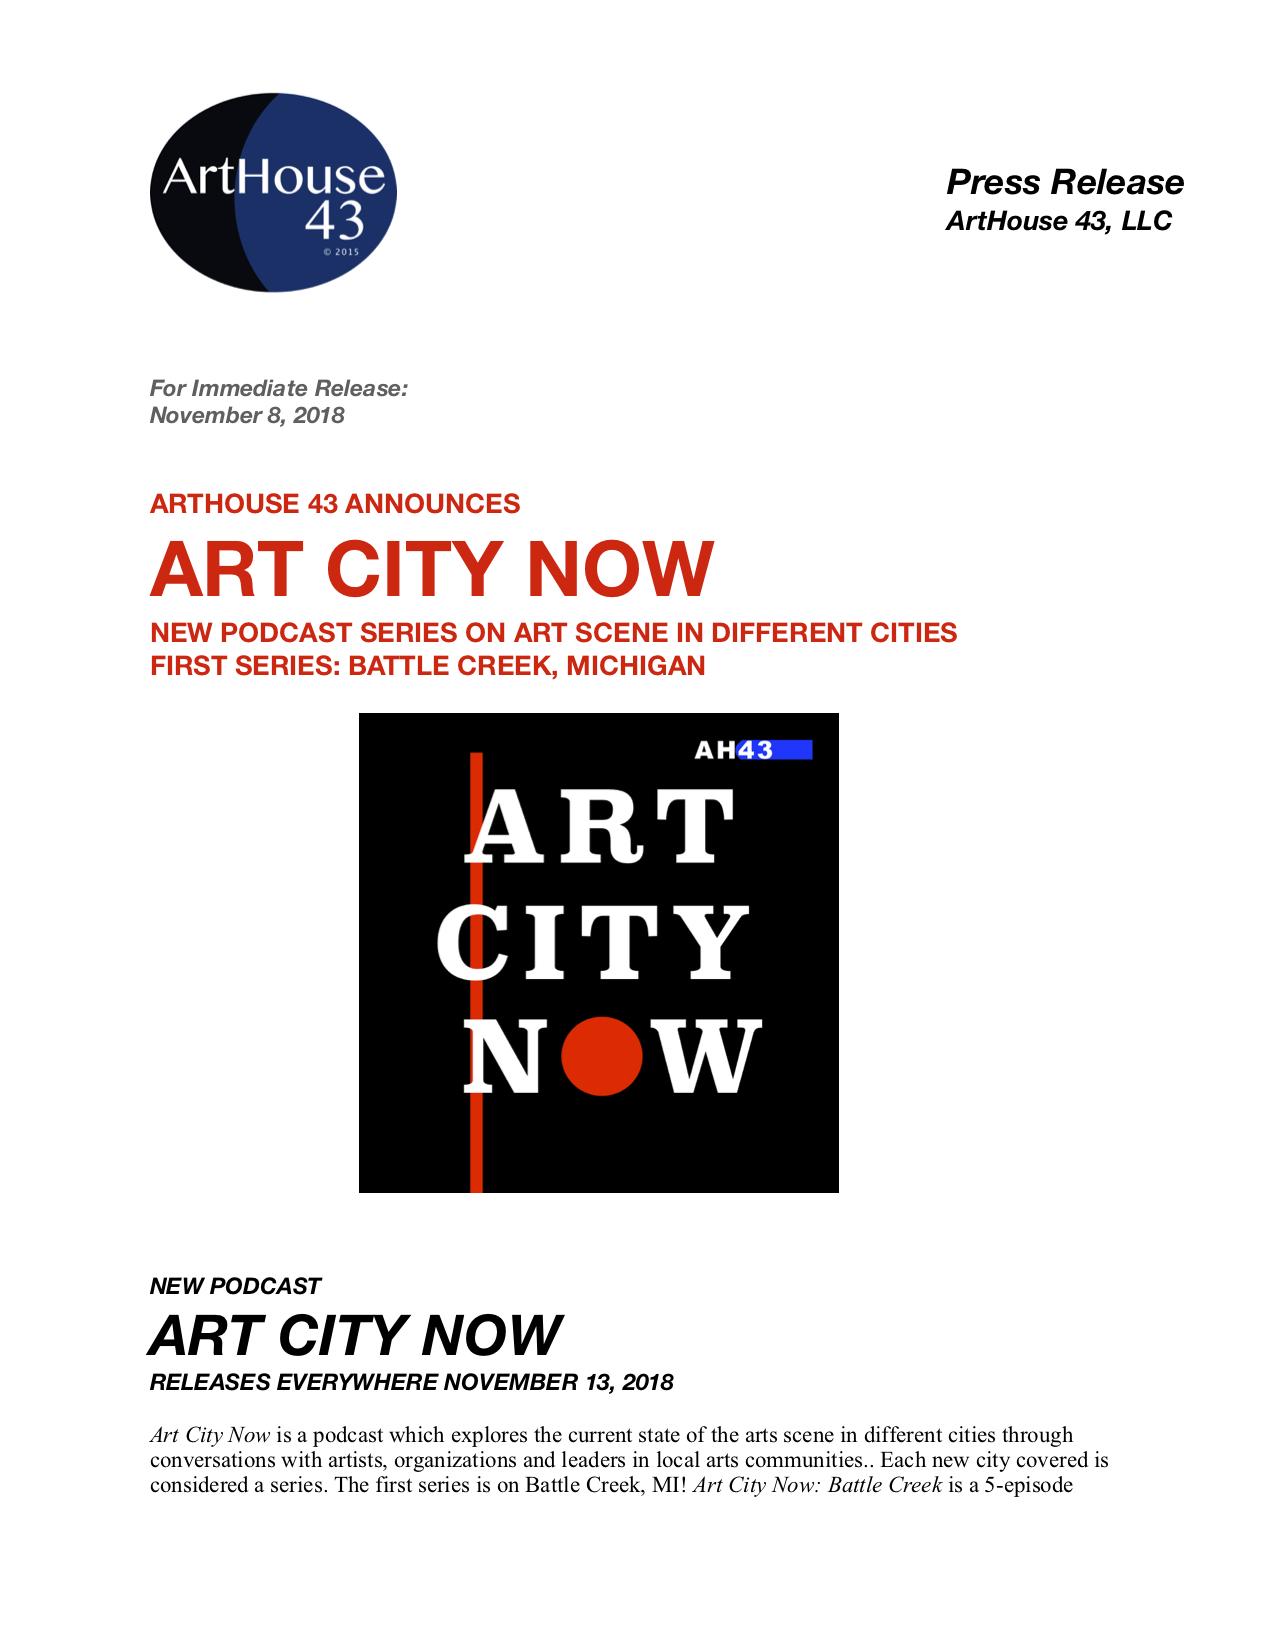 Art City Now Official Press Release.jpg